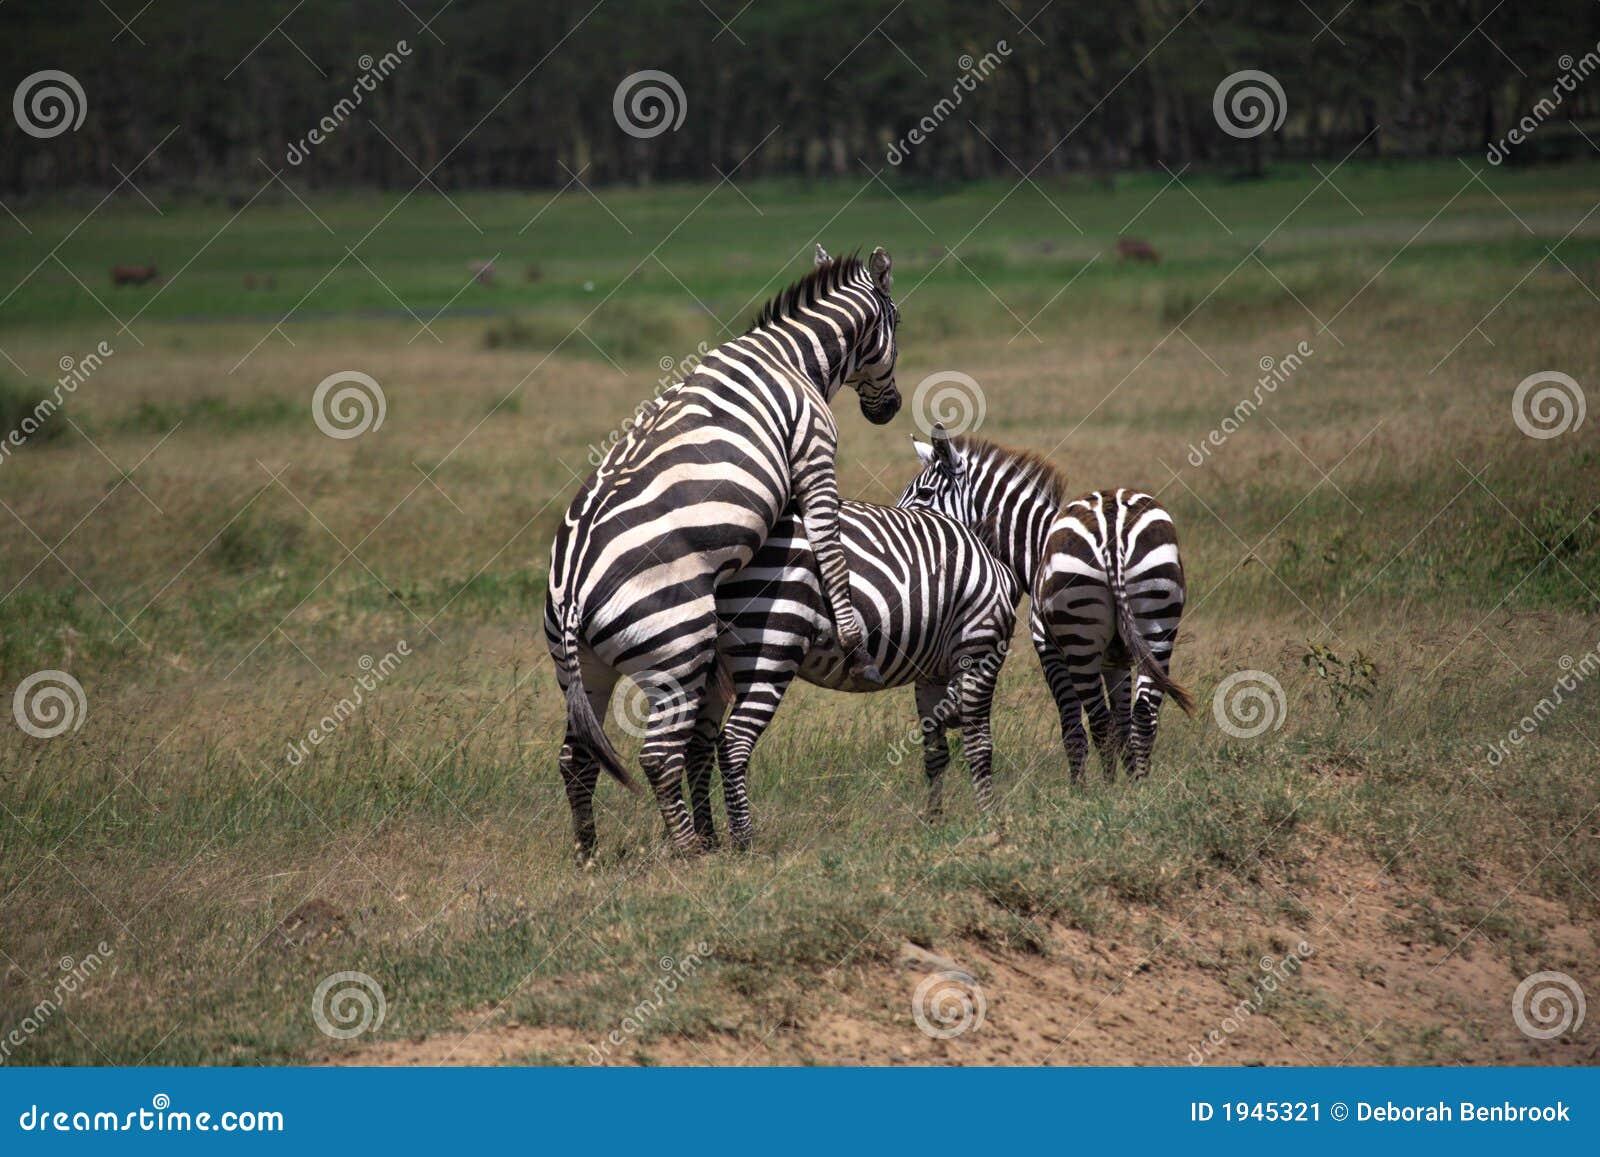 Horse Mating With Zebra Zebra mating